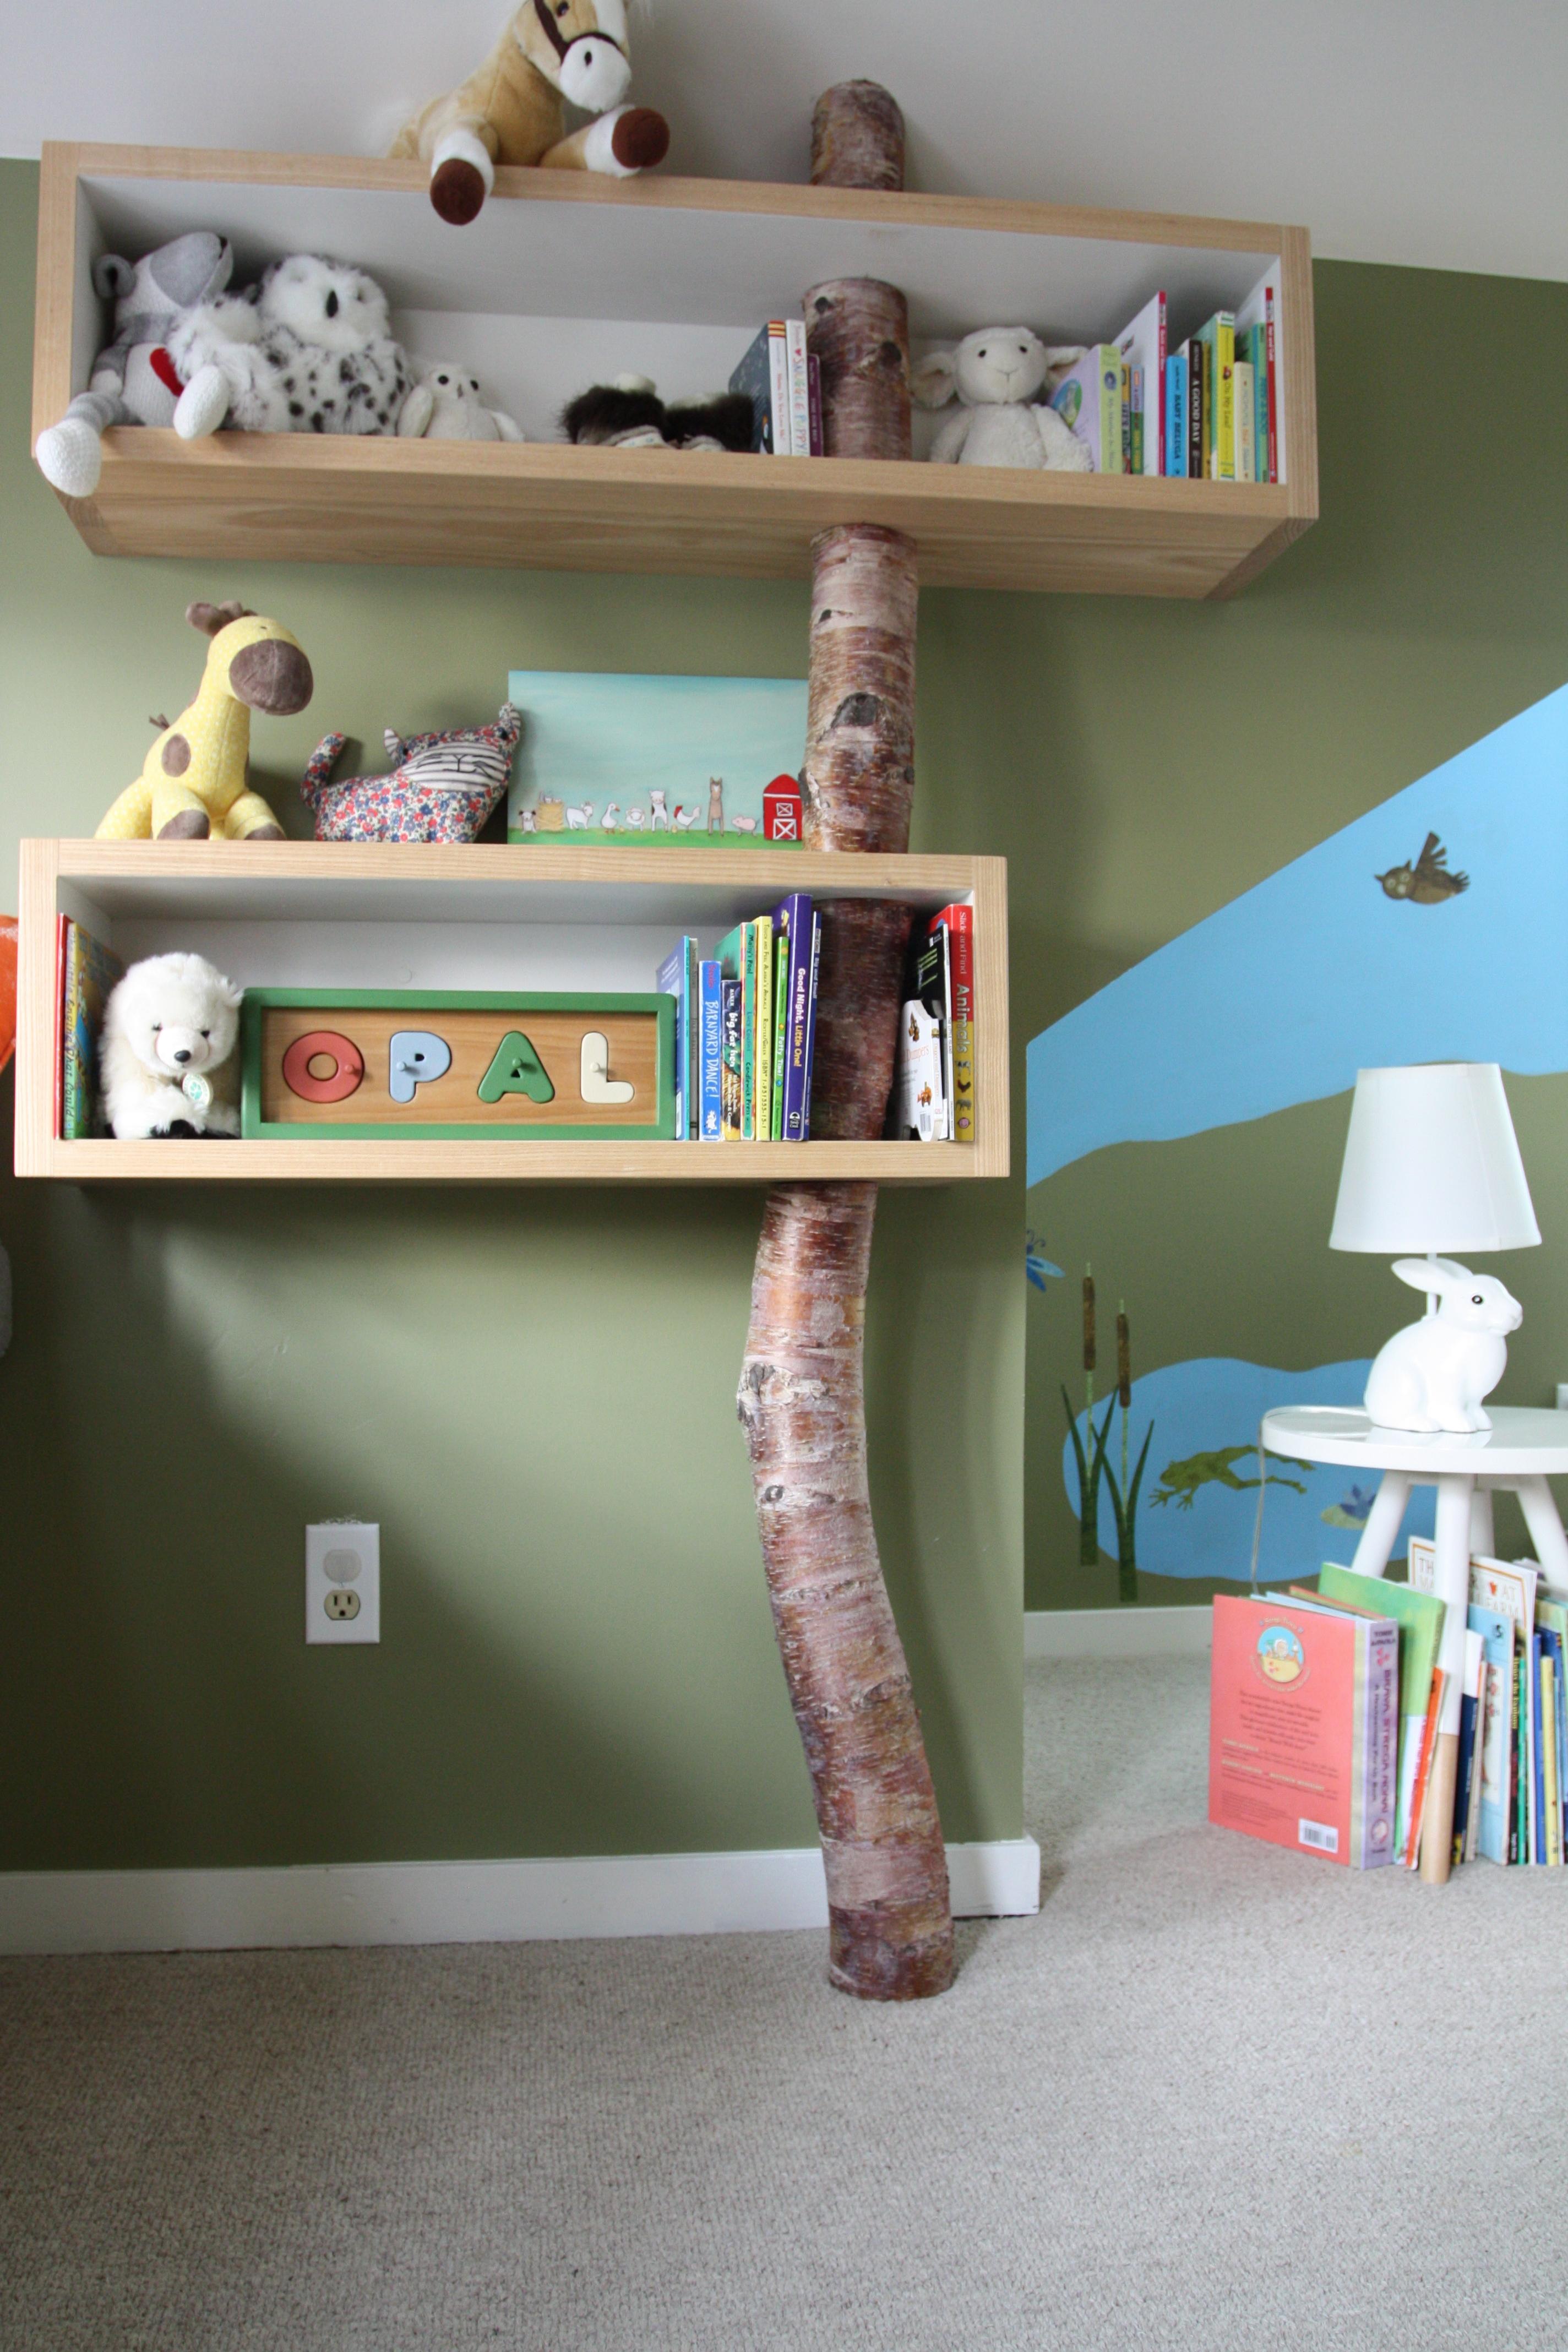 Opal's shelves